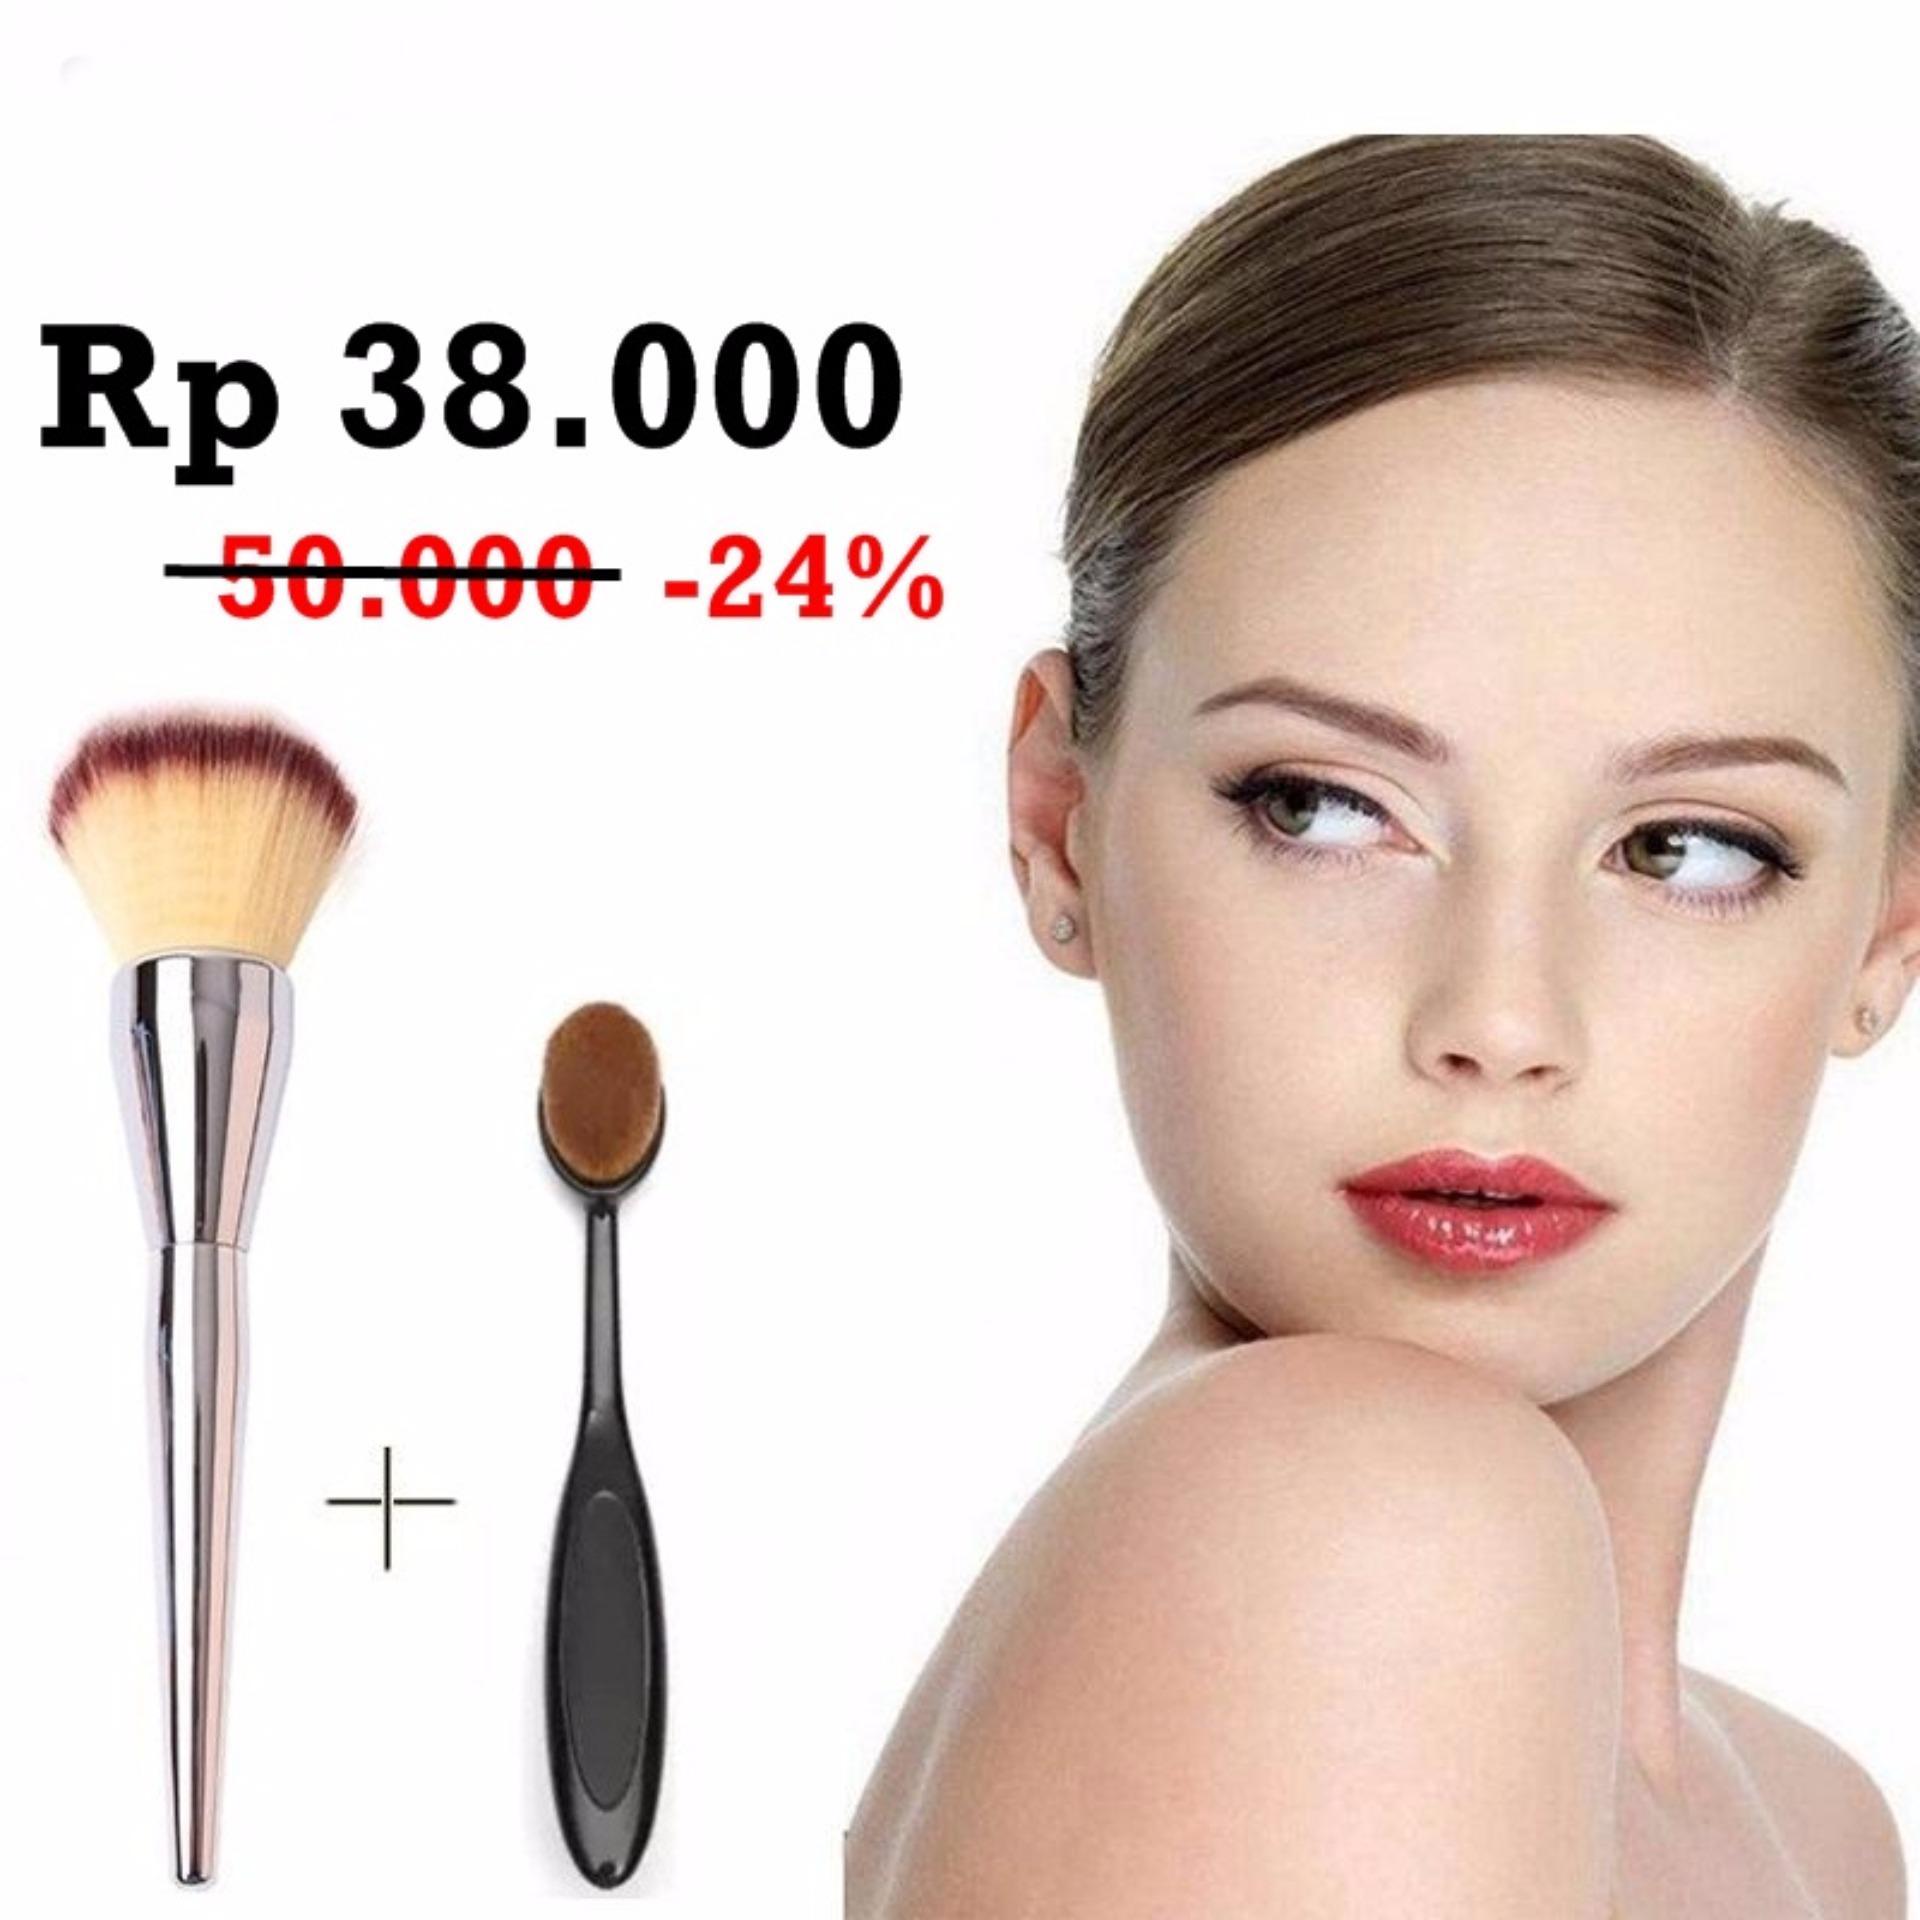 Jbs Kuas Oval Brush Foundation Naturgo Masker New York Set Makeup Paket K 070 Egg Spon Telur Bundle Powder Besi Dan K055 K002